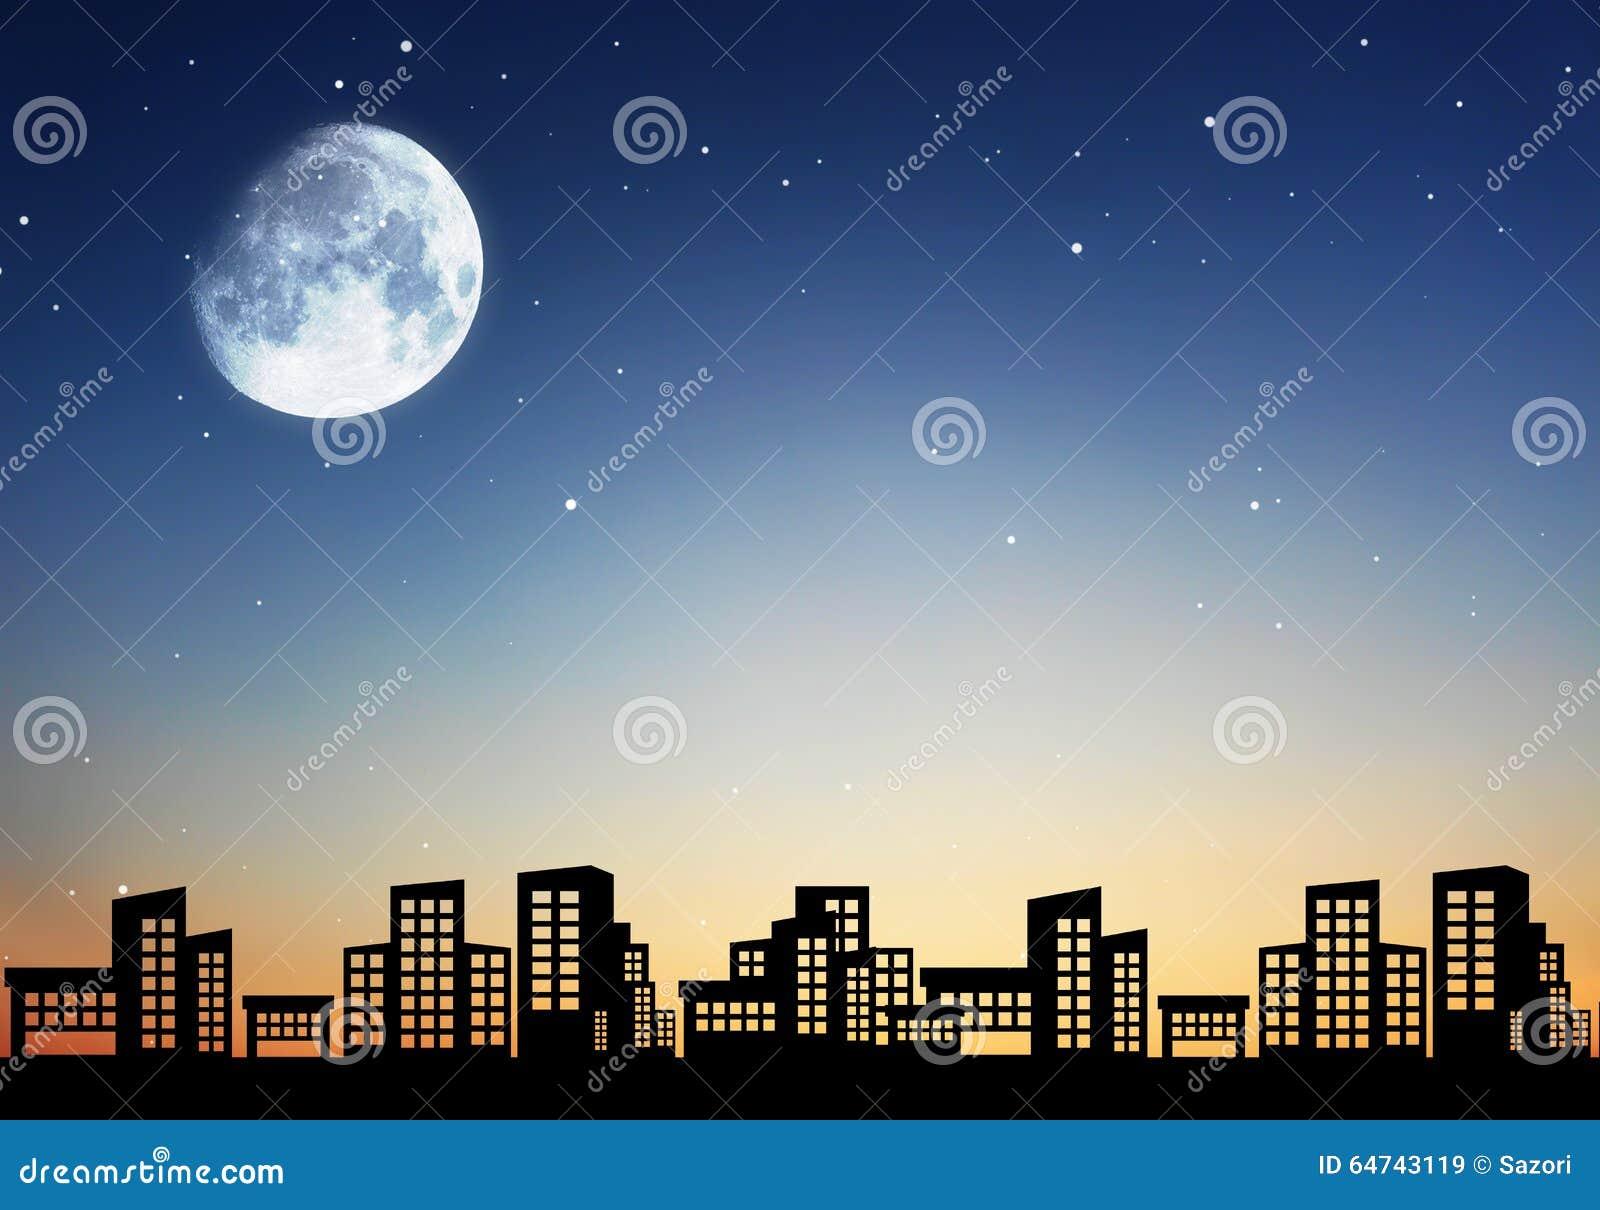 city night sky background - photo #19